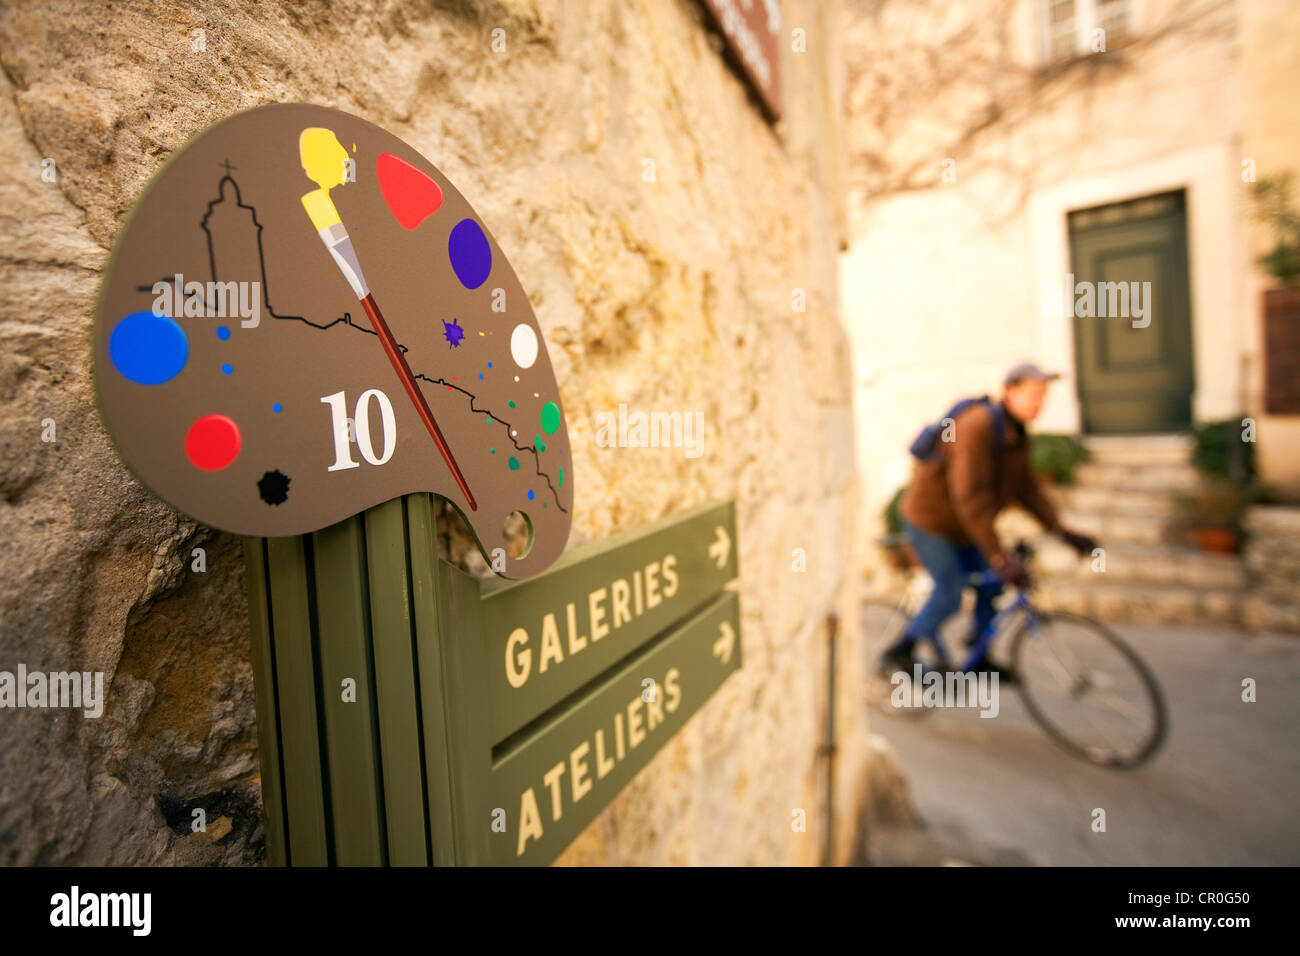 France, Alpes Maritimes, Mougins, Artists itinerary - Stock Image